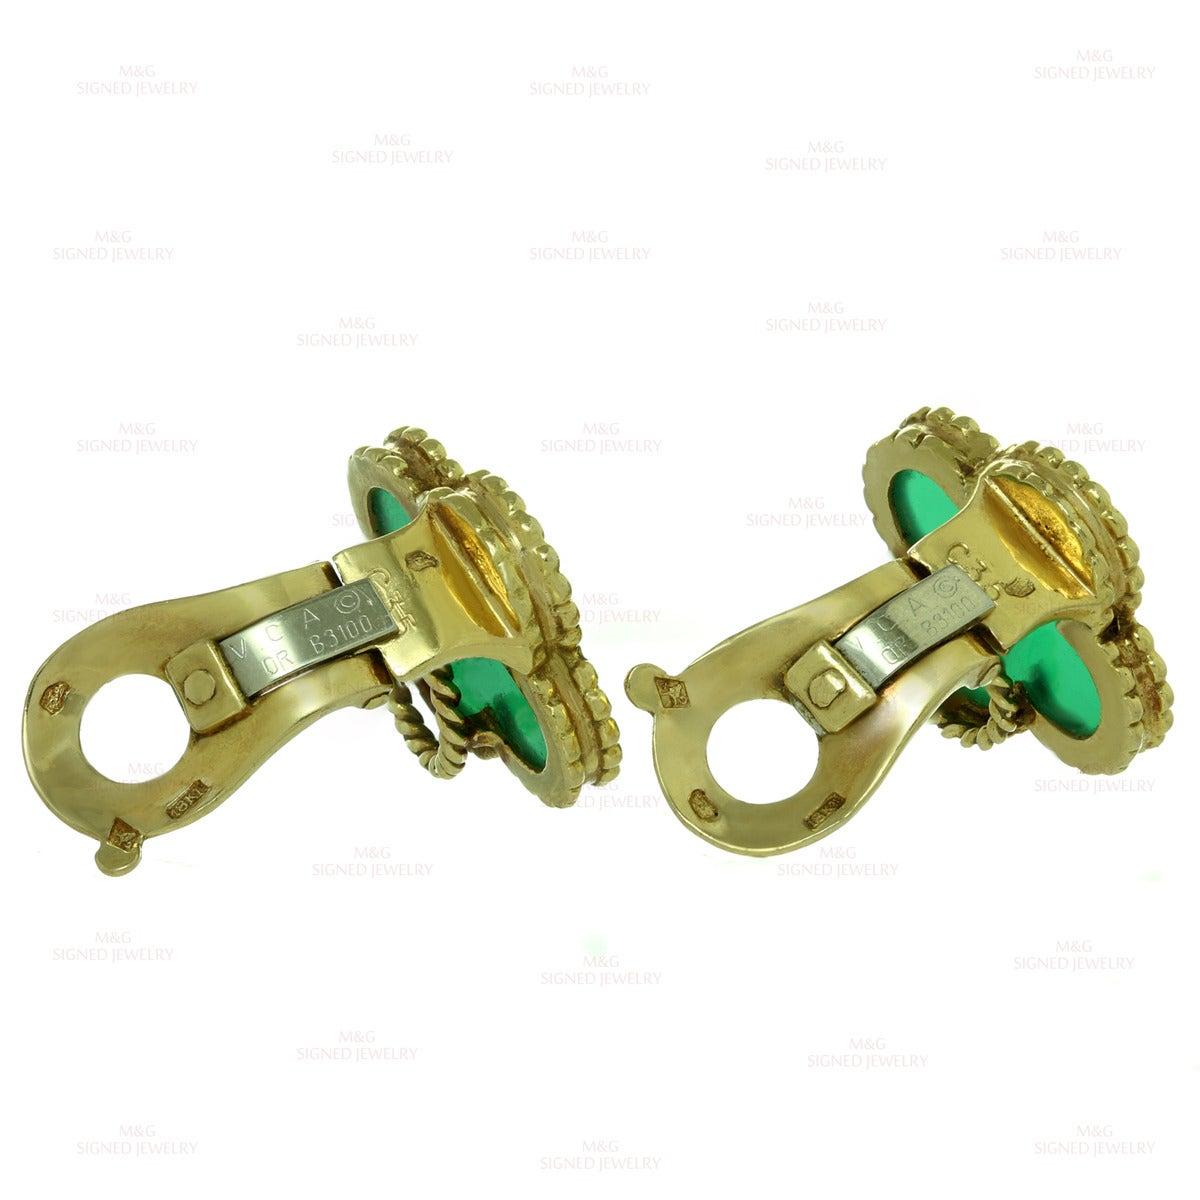 Women's 1970s Van Cleef & Arpels Alhambra Green Chalcedony Gold Earrings For Sale